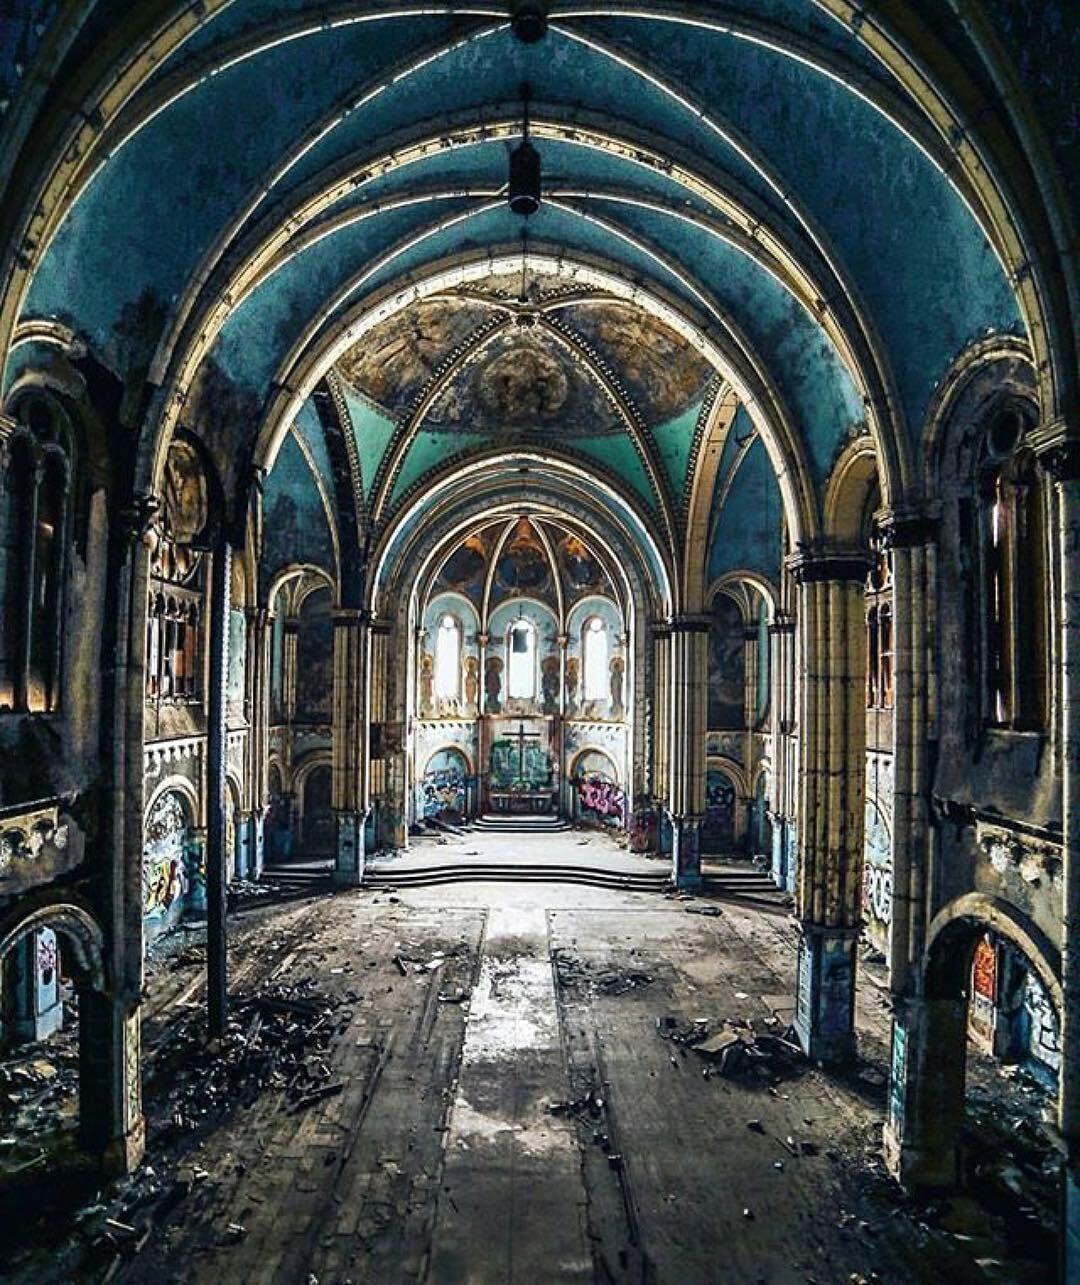 Abandoned Church - Photo By @taelorschermann